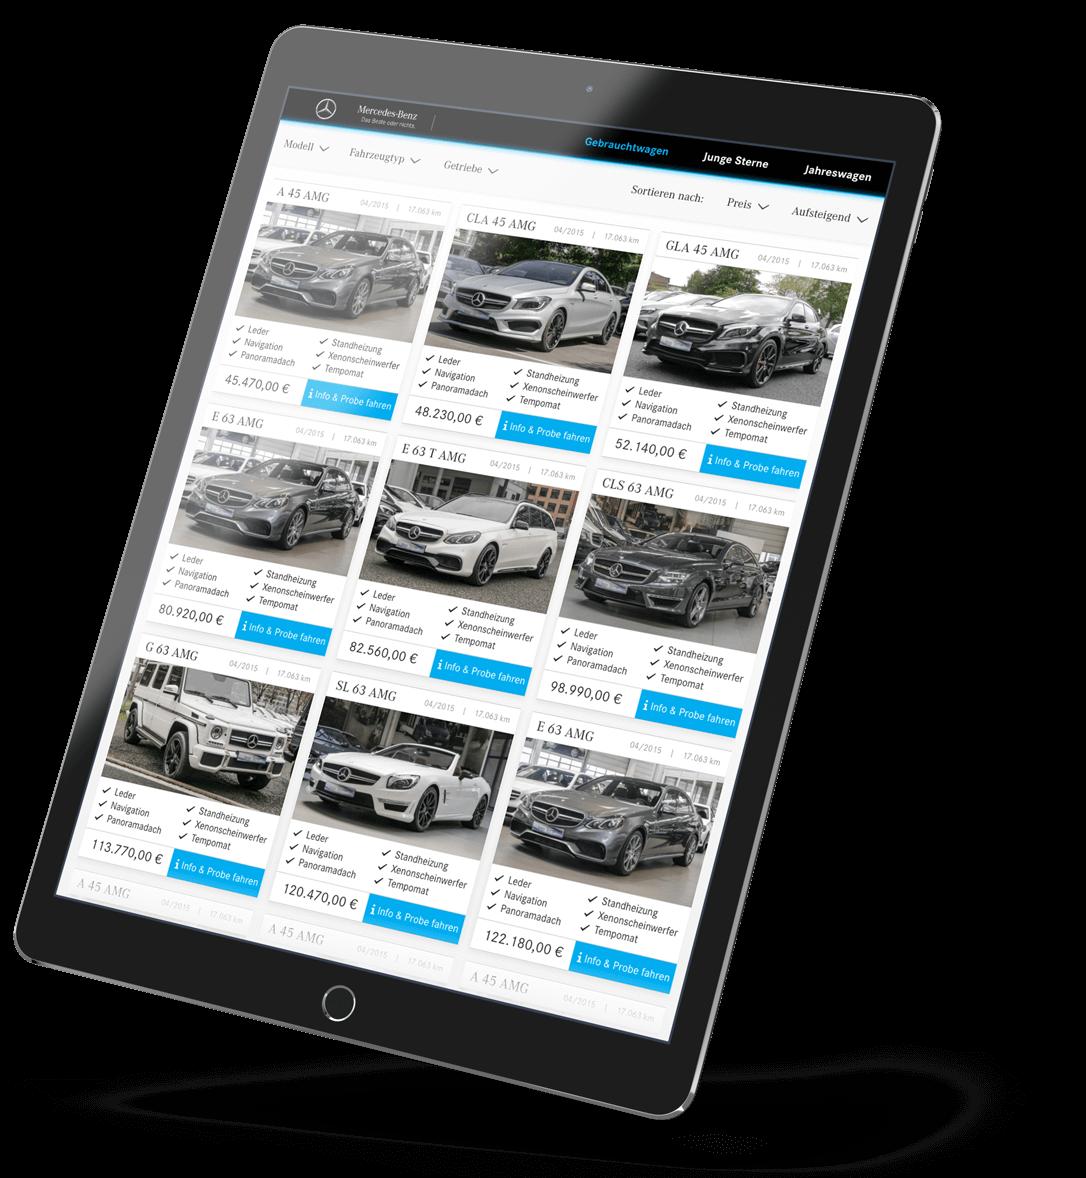 Ipad Pro Digital Sales Application